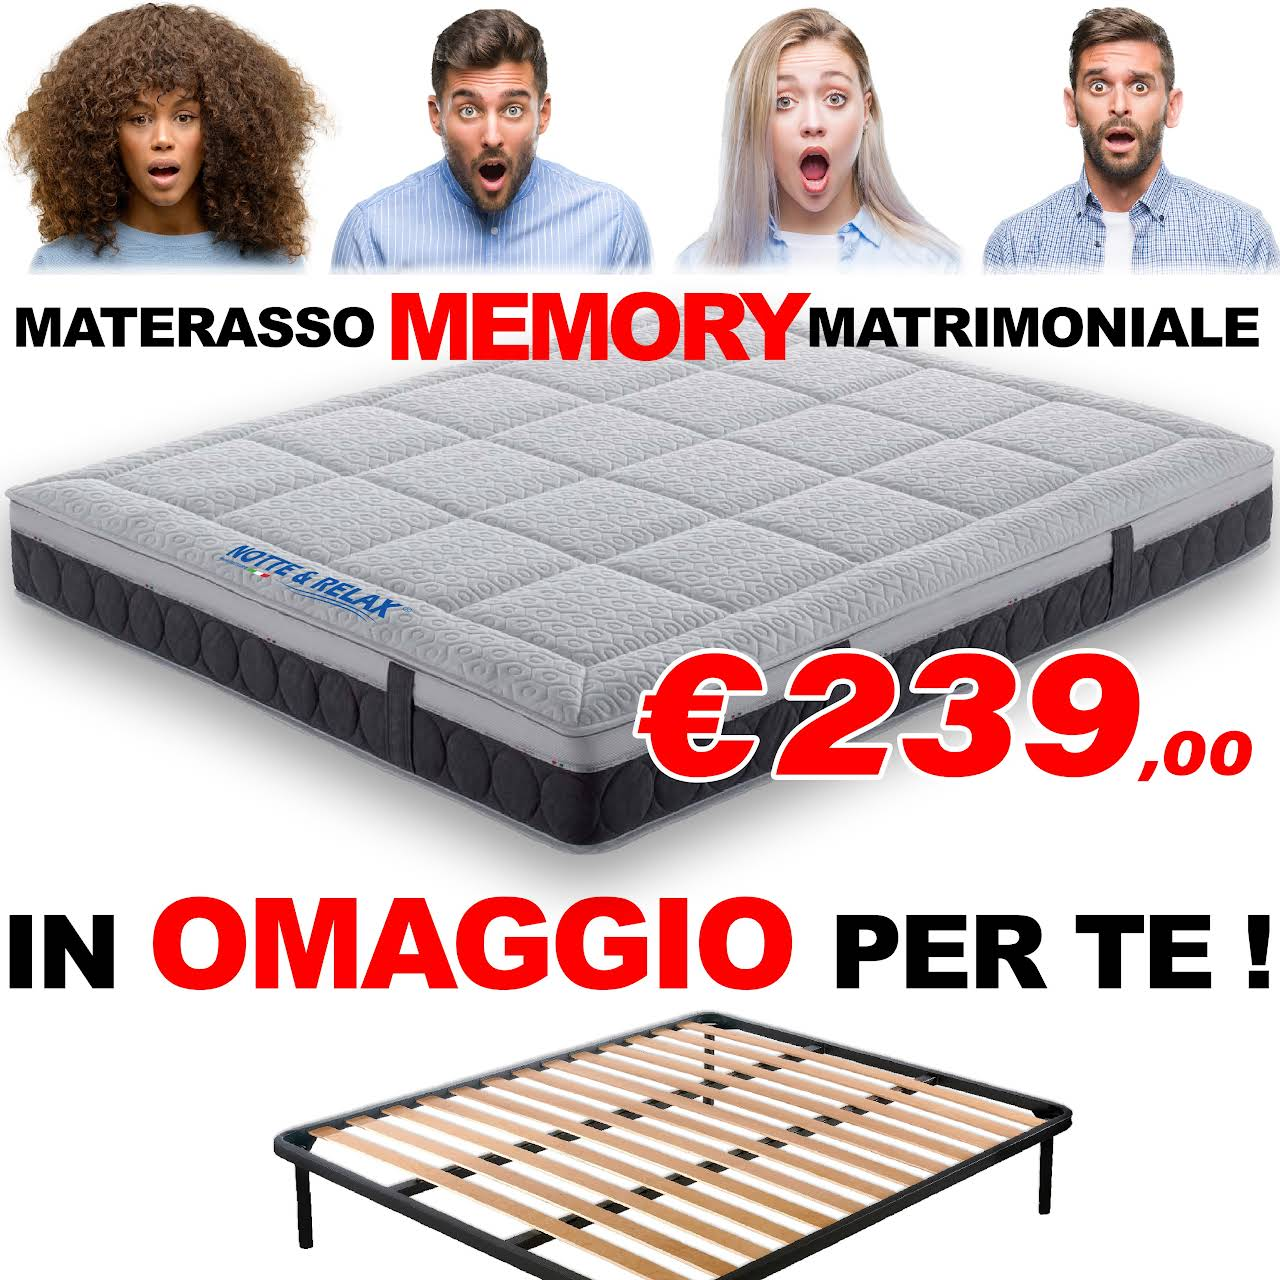 Notte Relax Materassi.Notte Relax Materassi Negozio Di Materassi A Cecchina